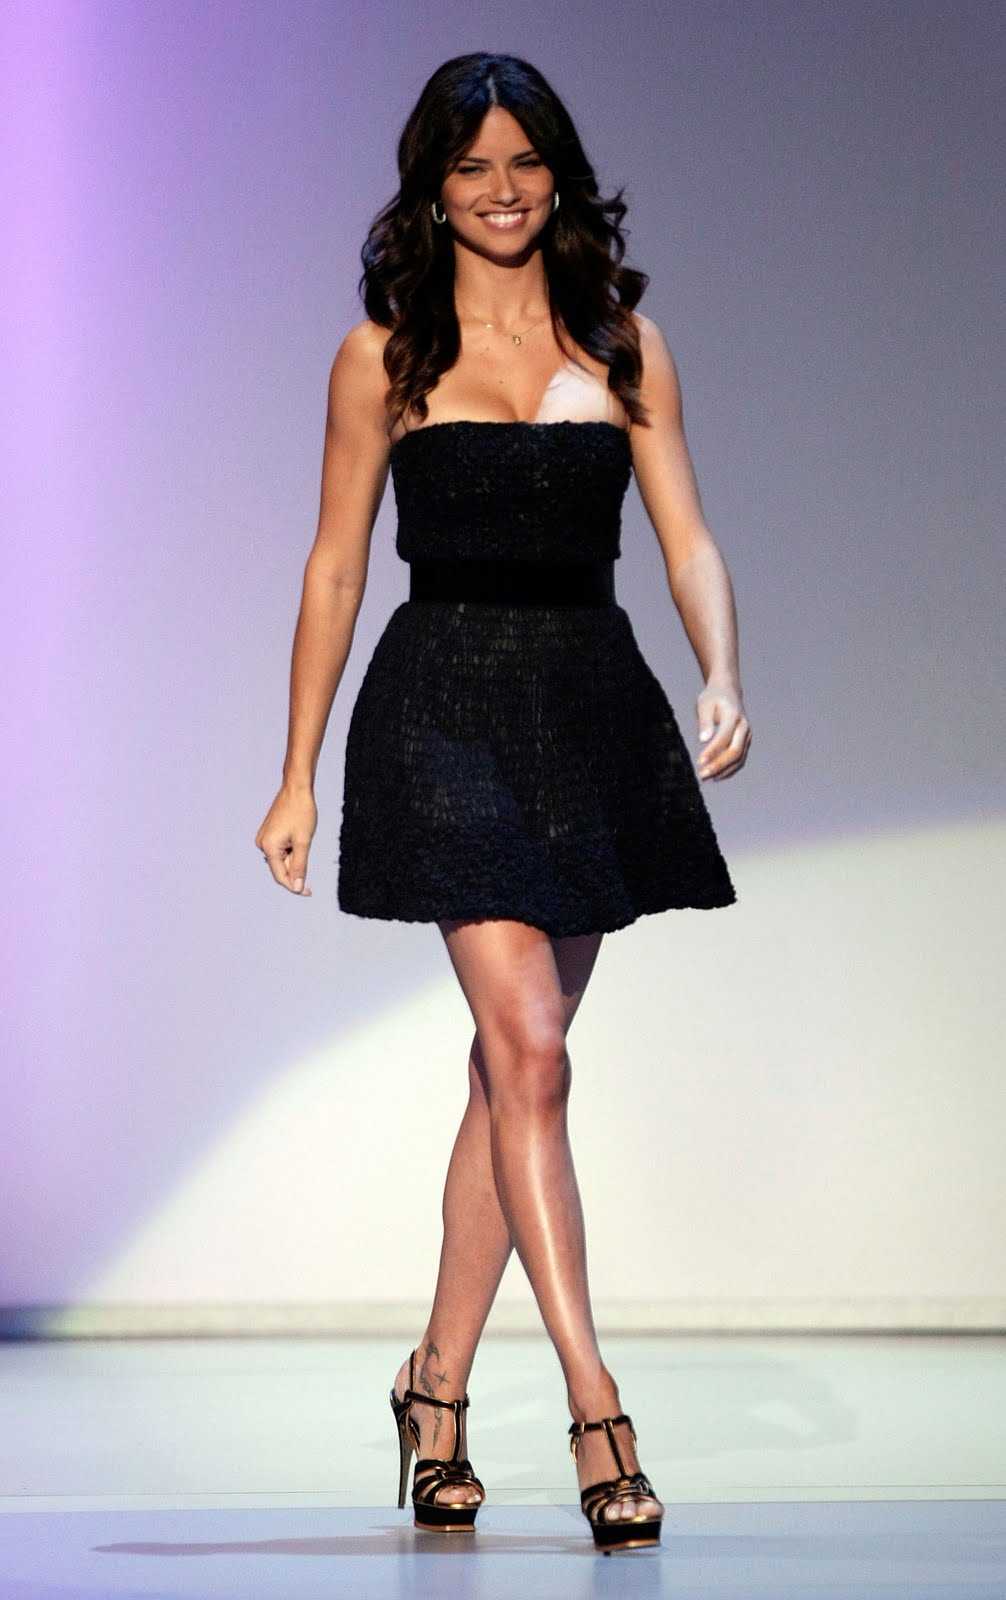 Adriana Lima has stunning feet